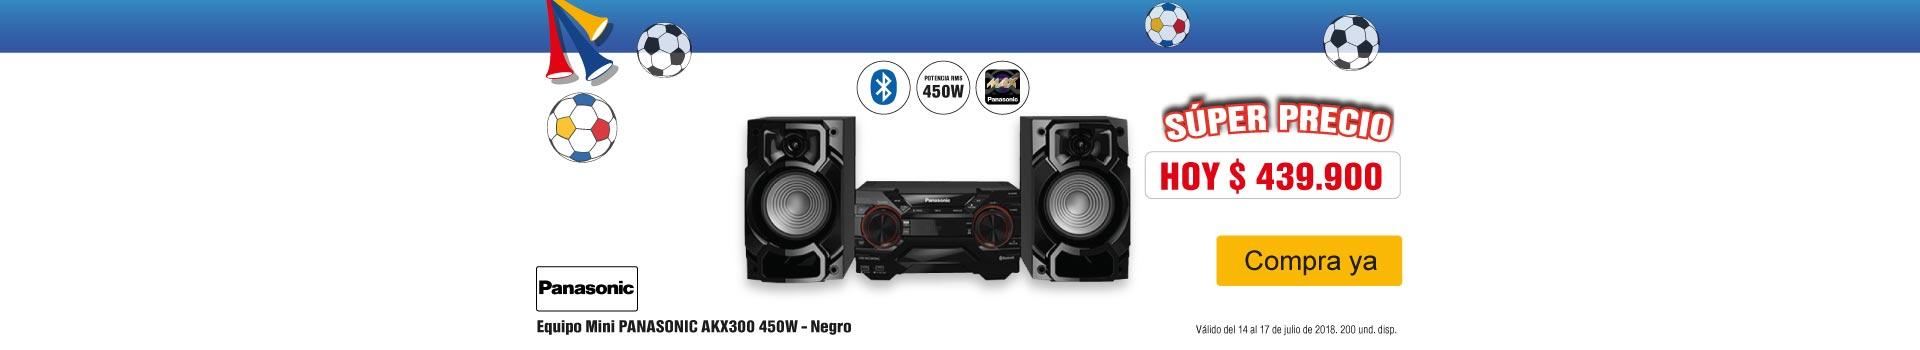 AK-KT-BCAT-9-audio-DCAT---Panasonic-akx300-Jul14